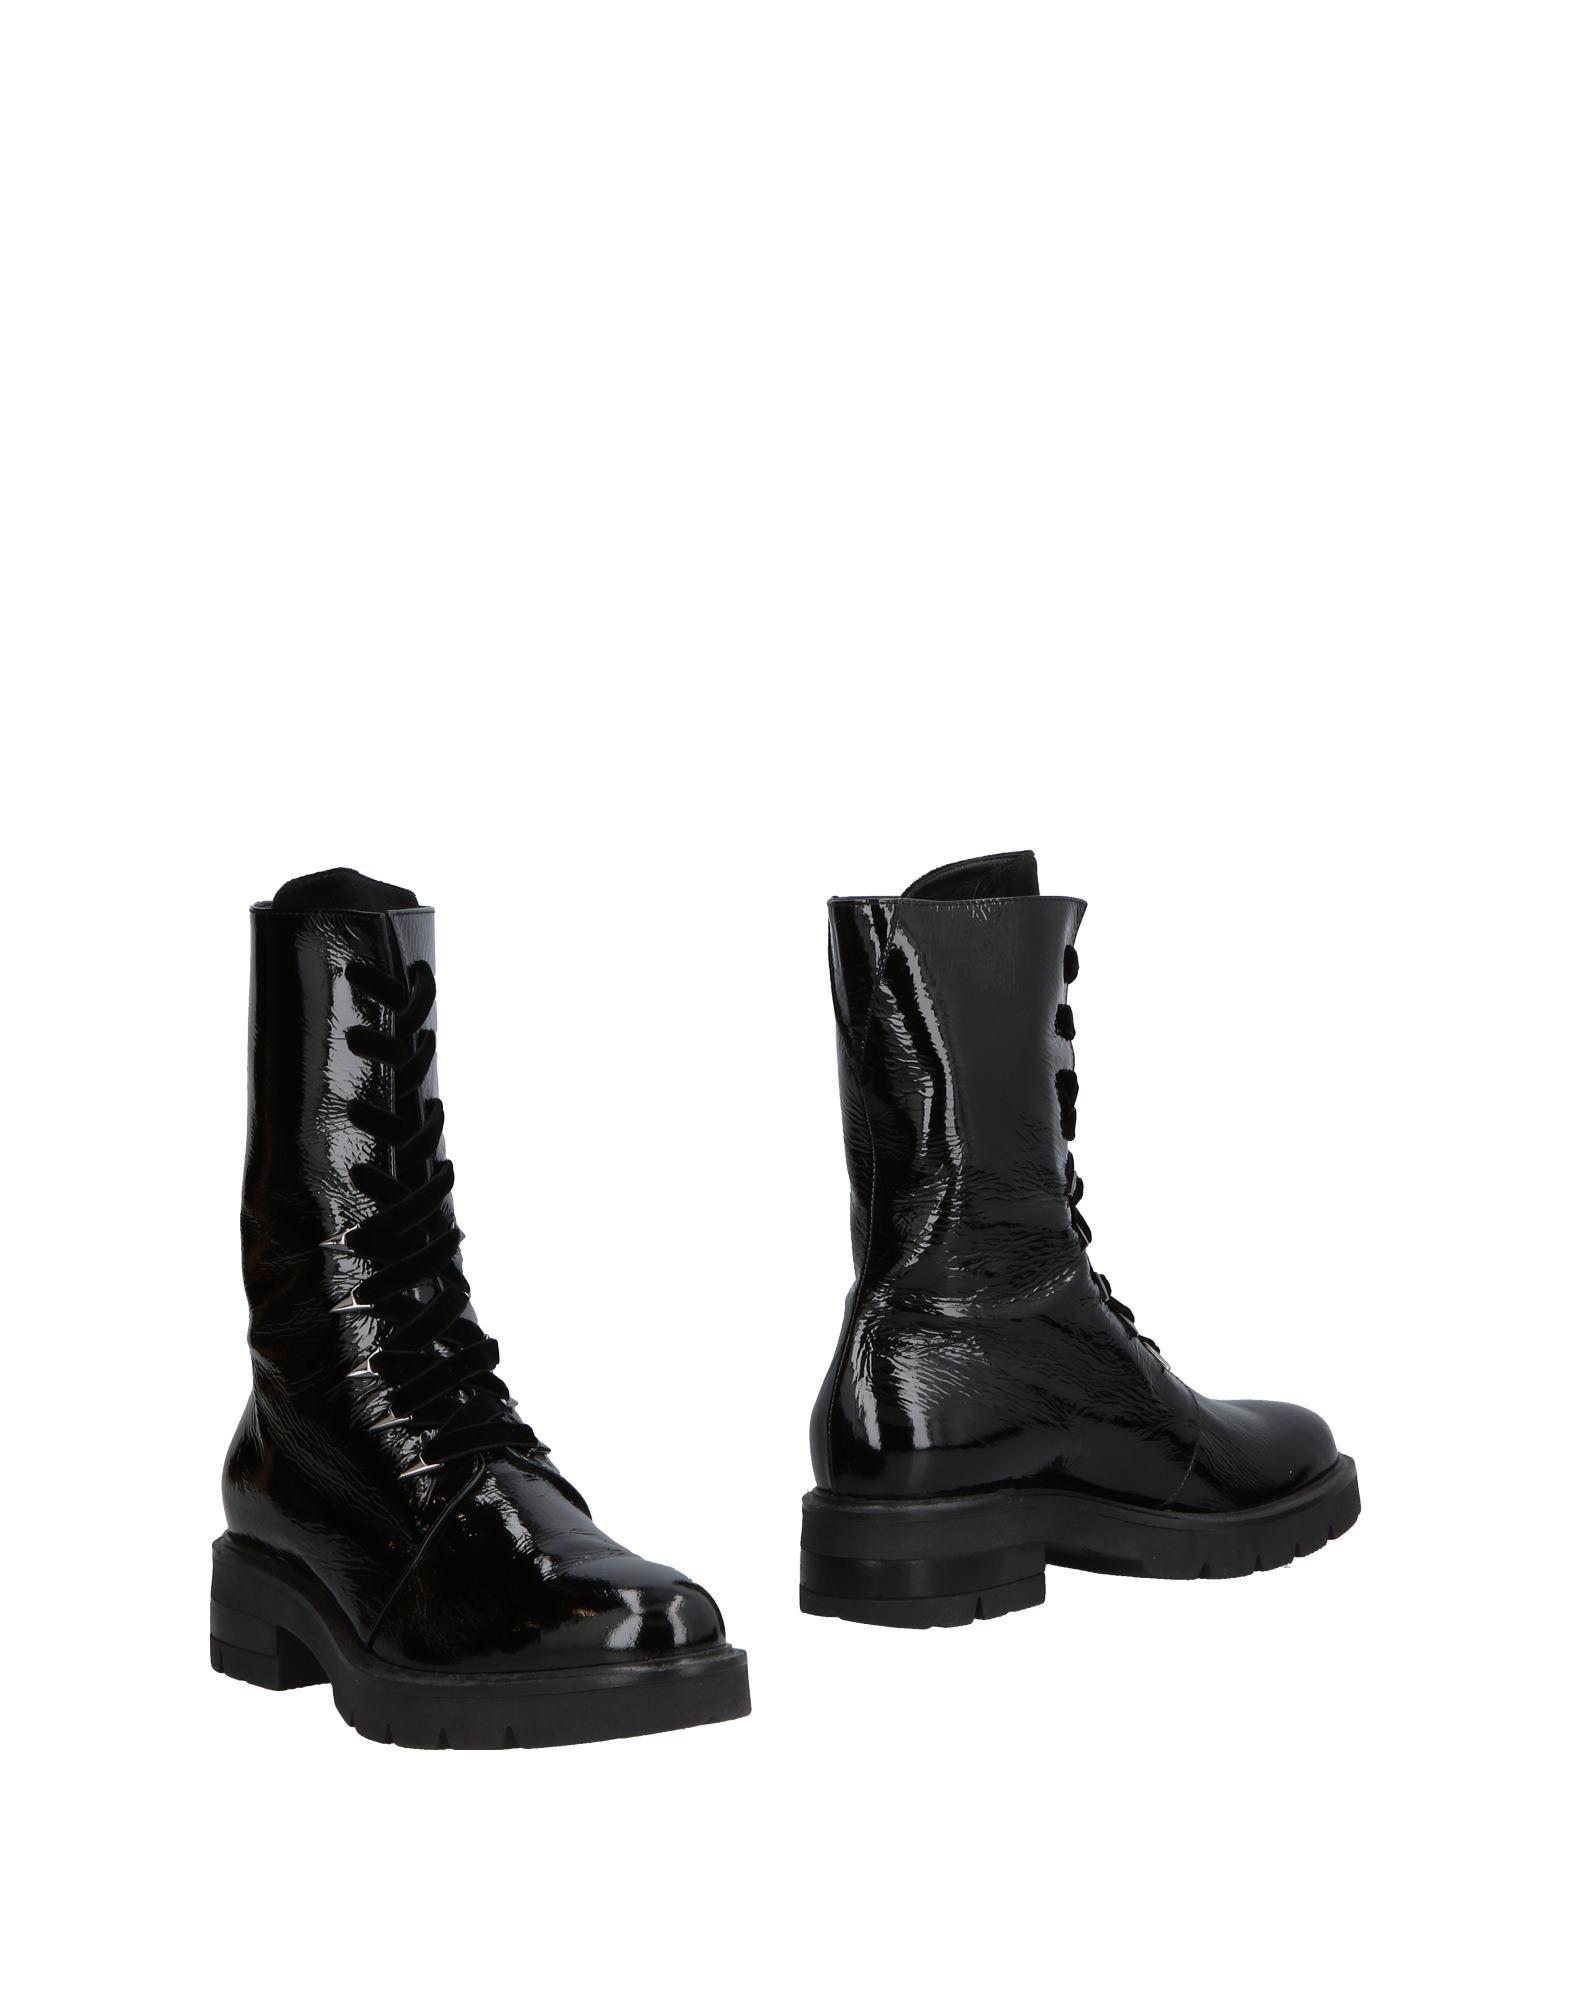 Rabatt Schuhe Lamperti Milano Stiefelette Damen  11496235PD